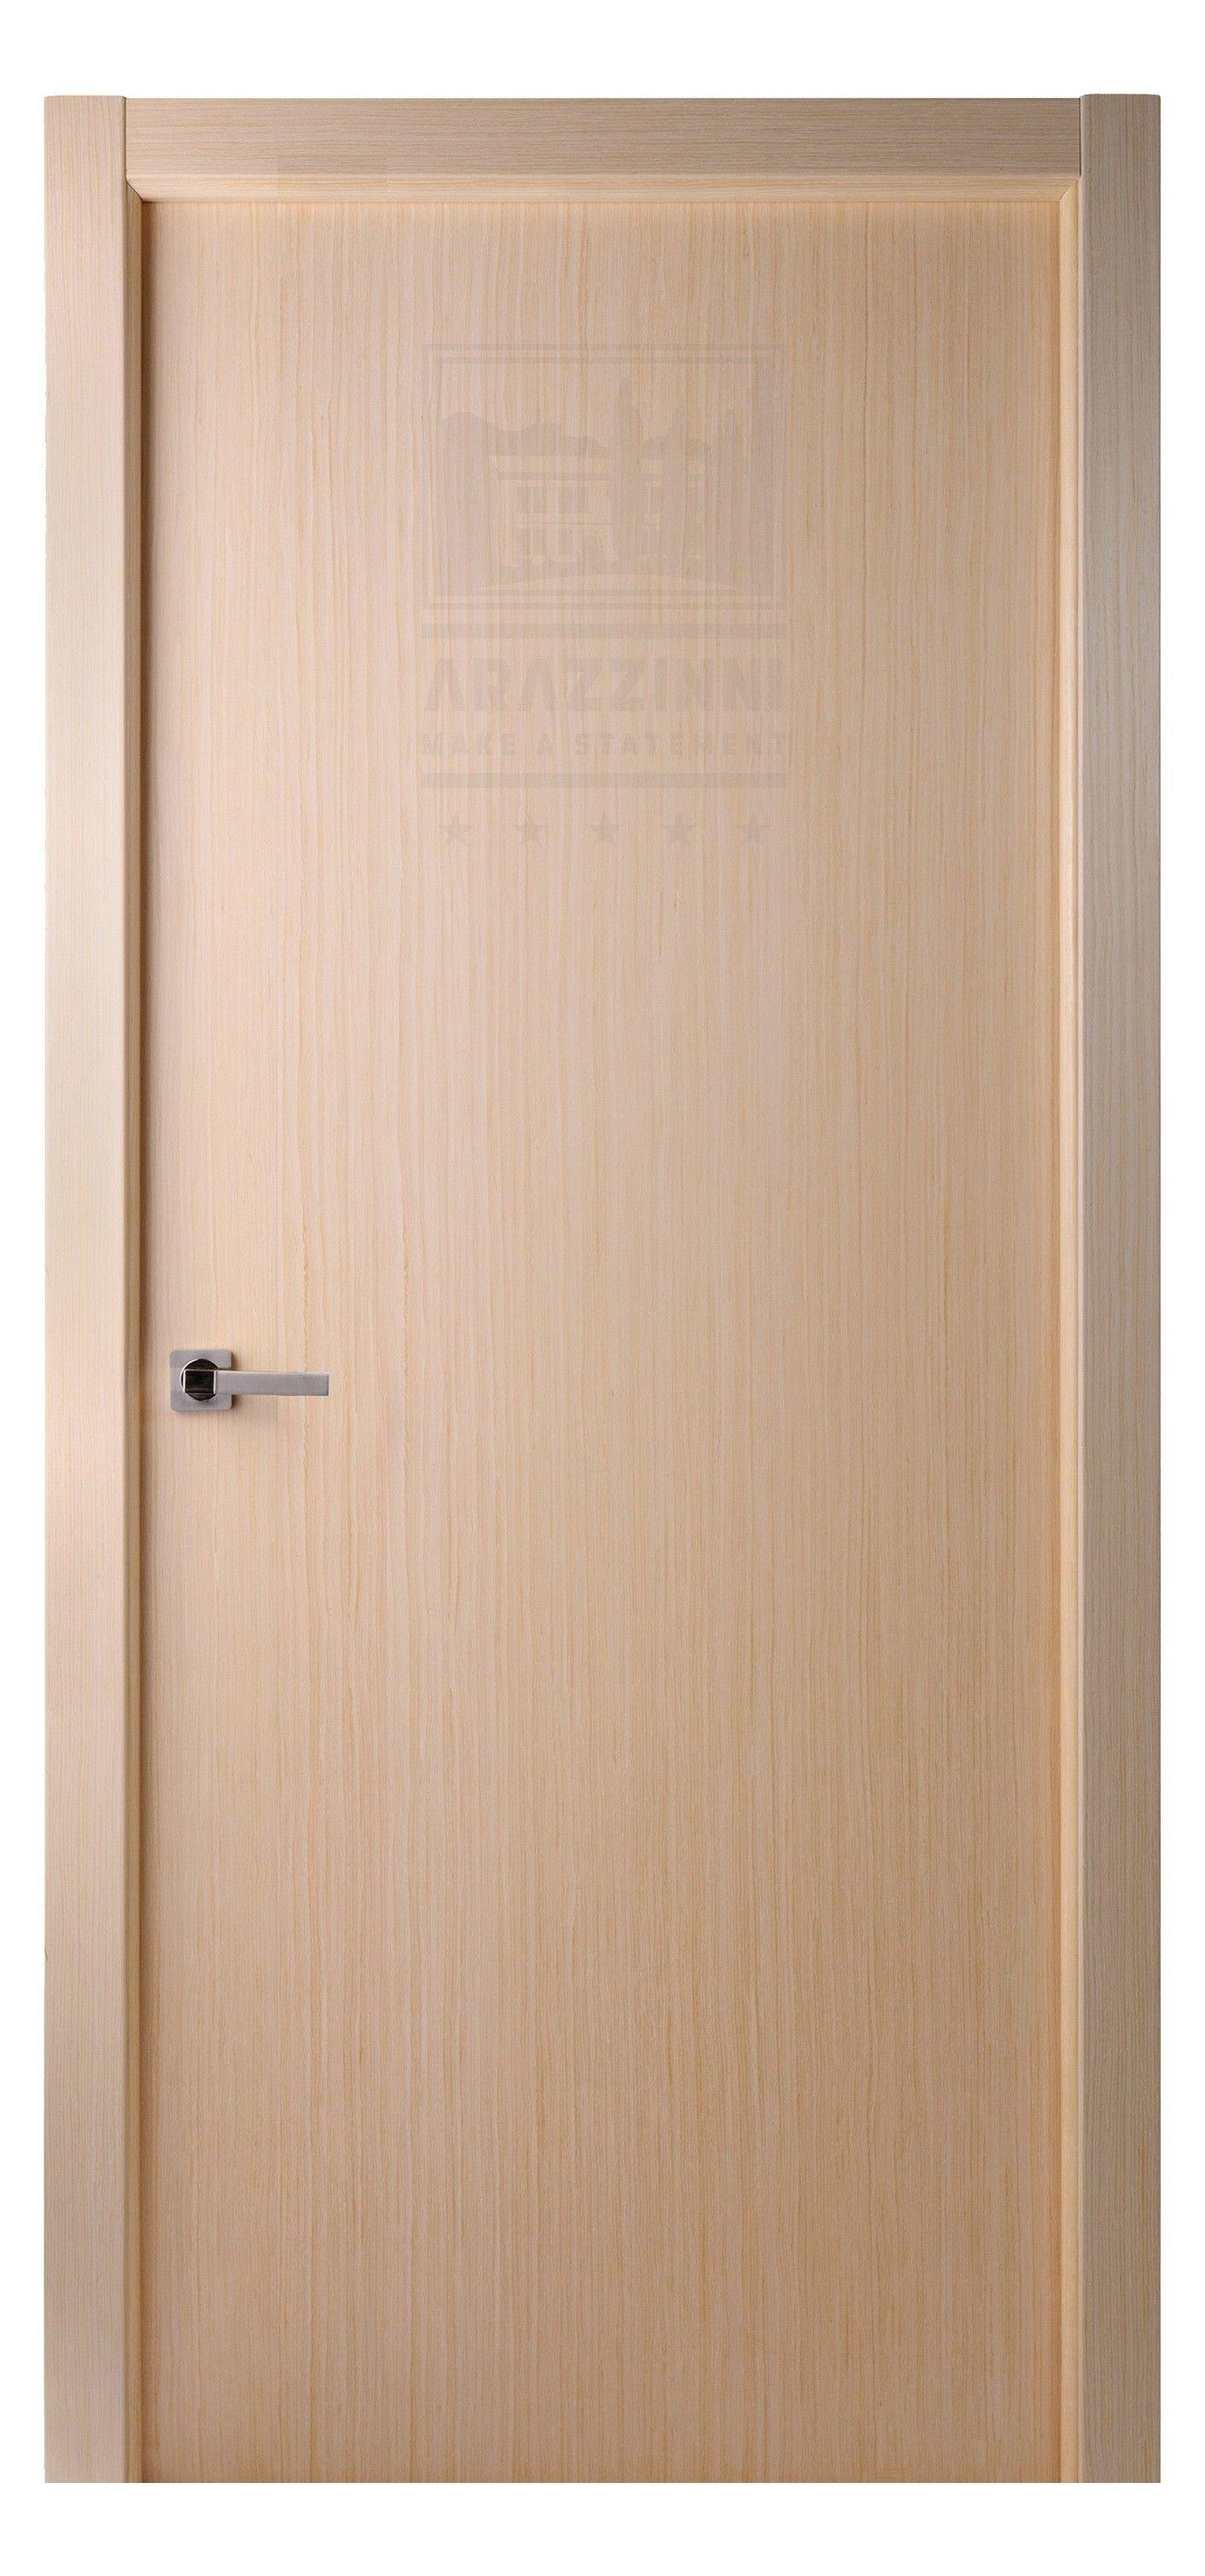 Exceptionnel Classica Ultra 8 Ft. Interior Door Bleached Oak